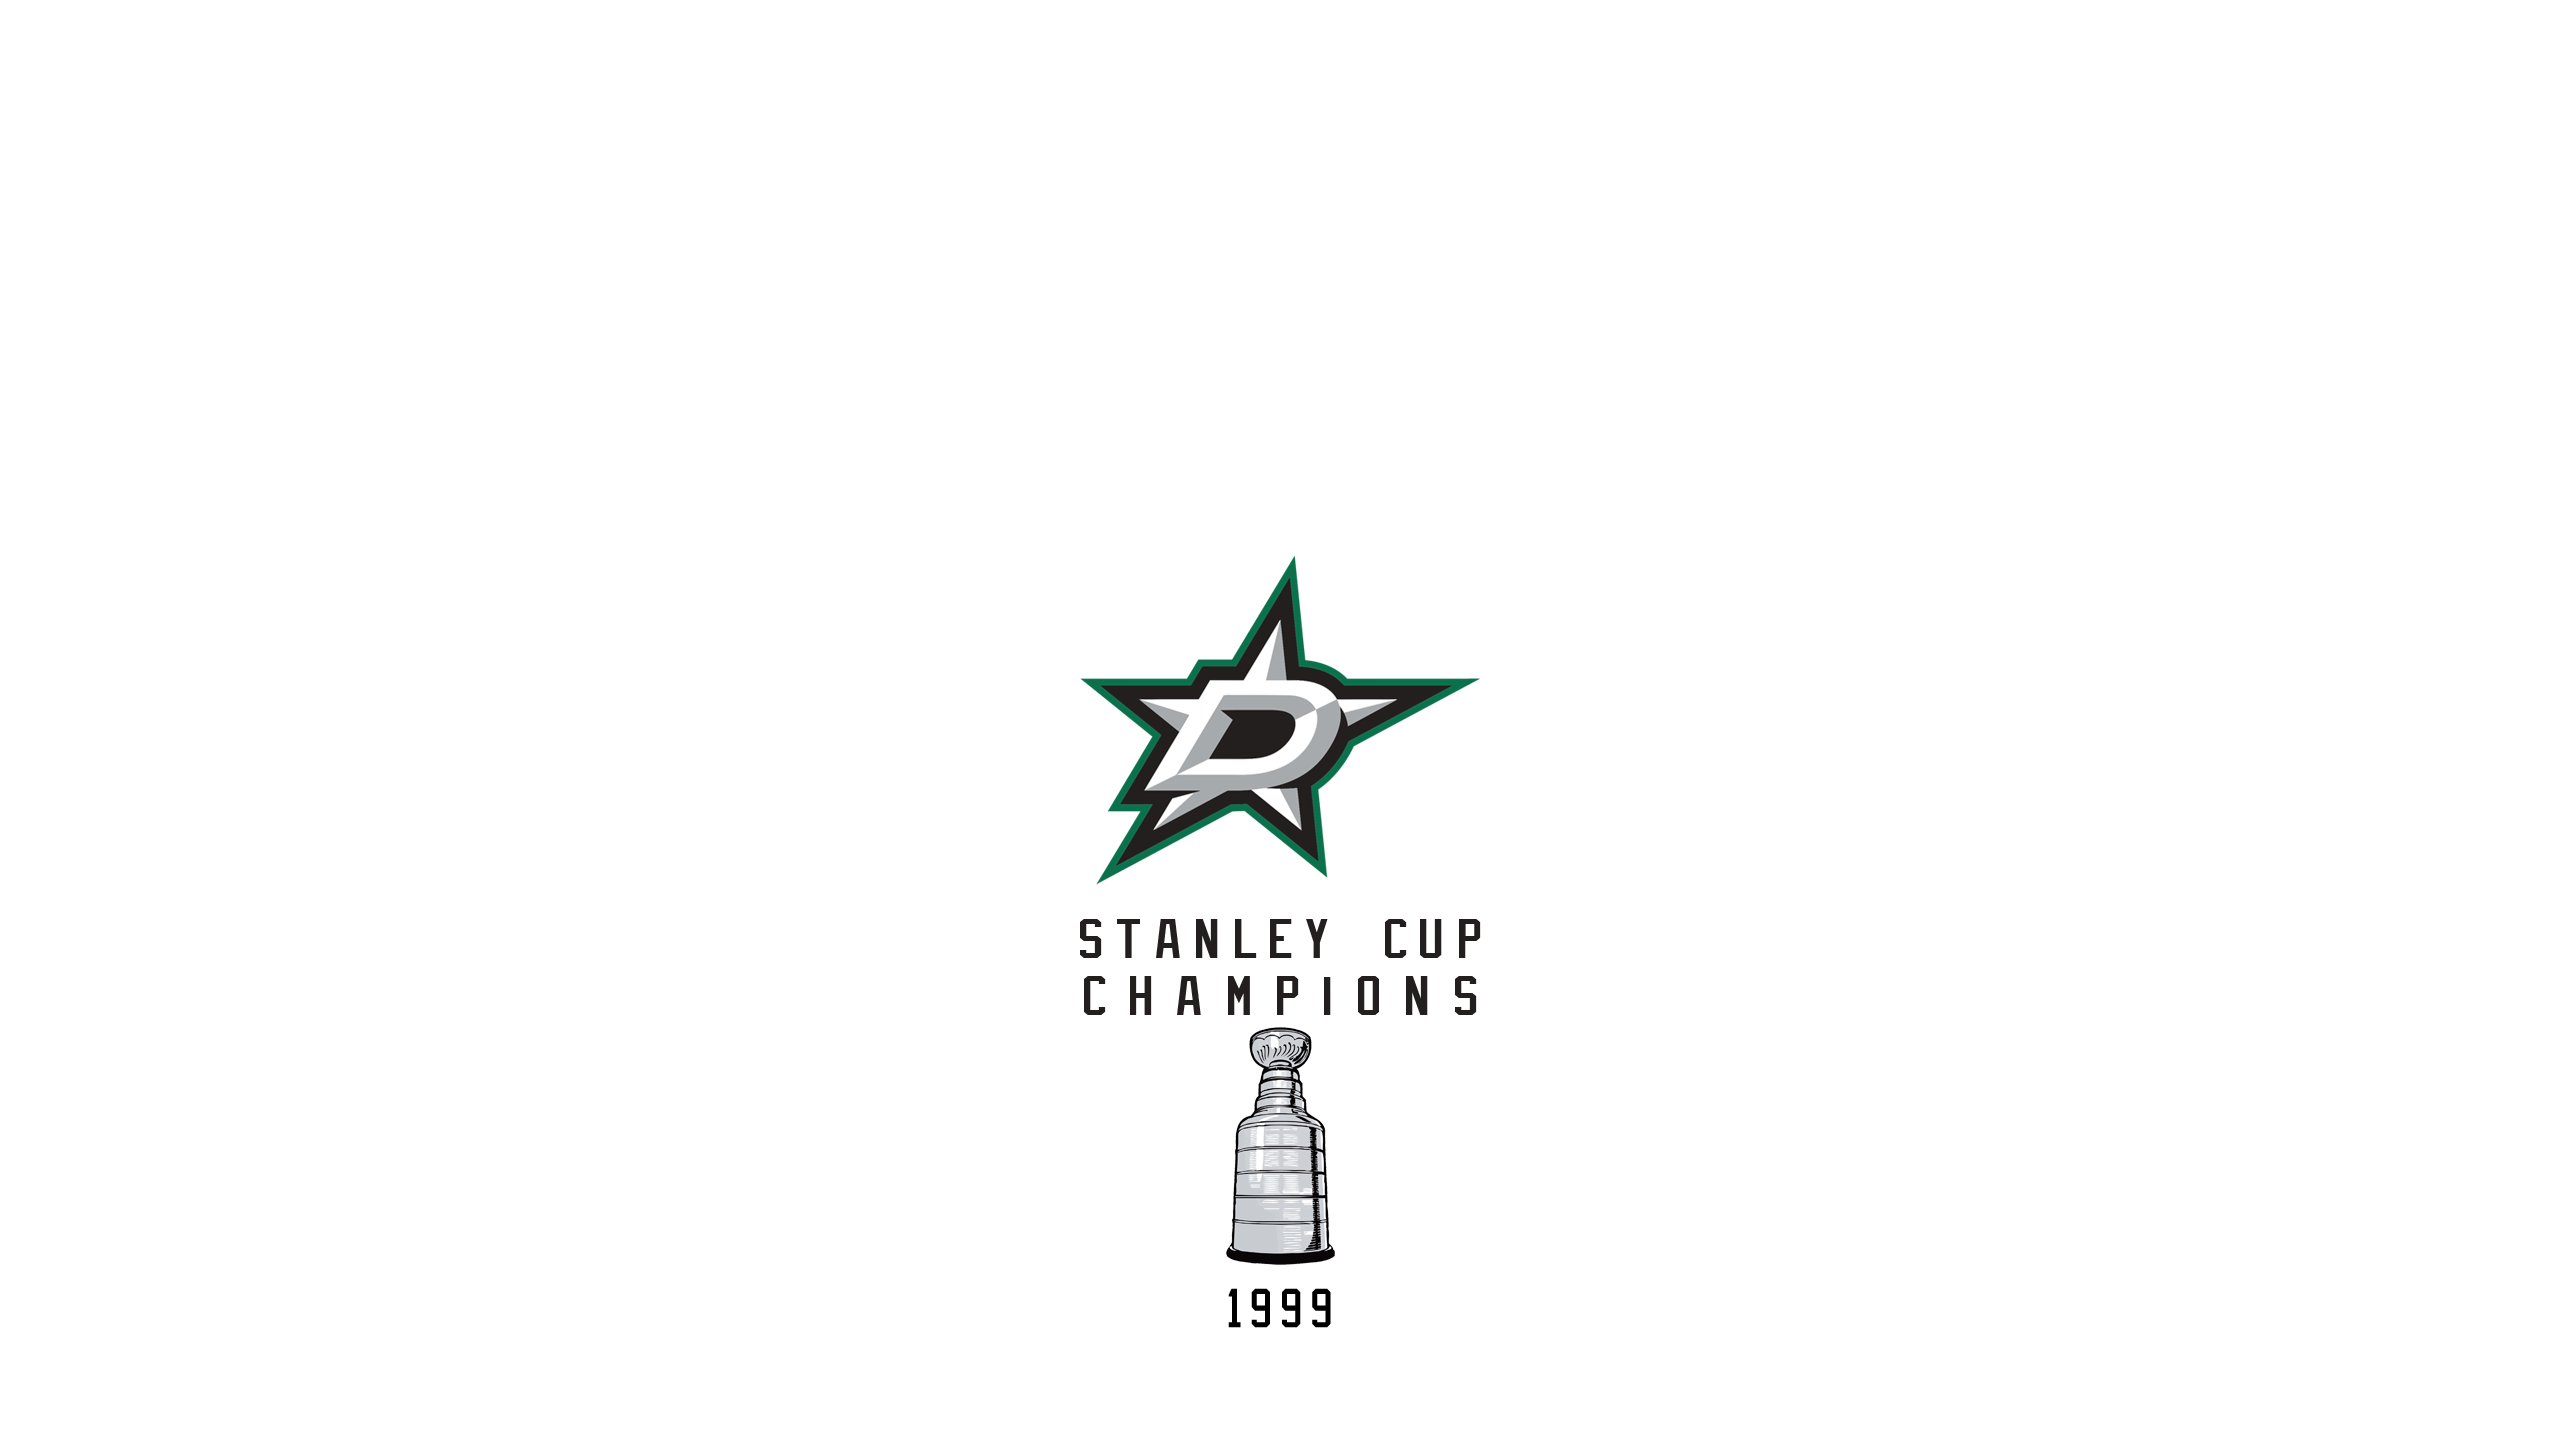 Dallas Stars - Stanley Cup